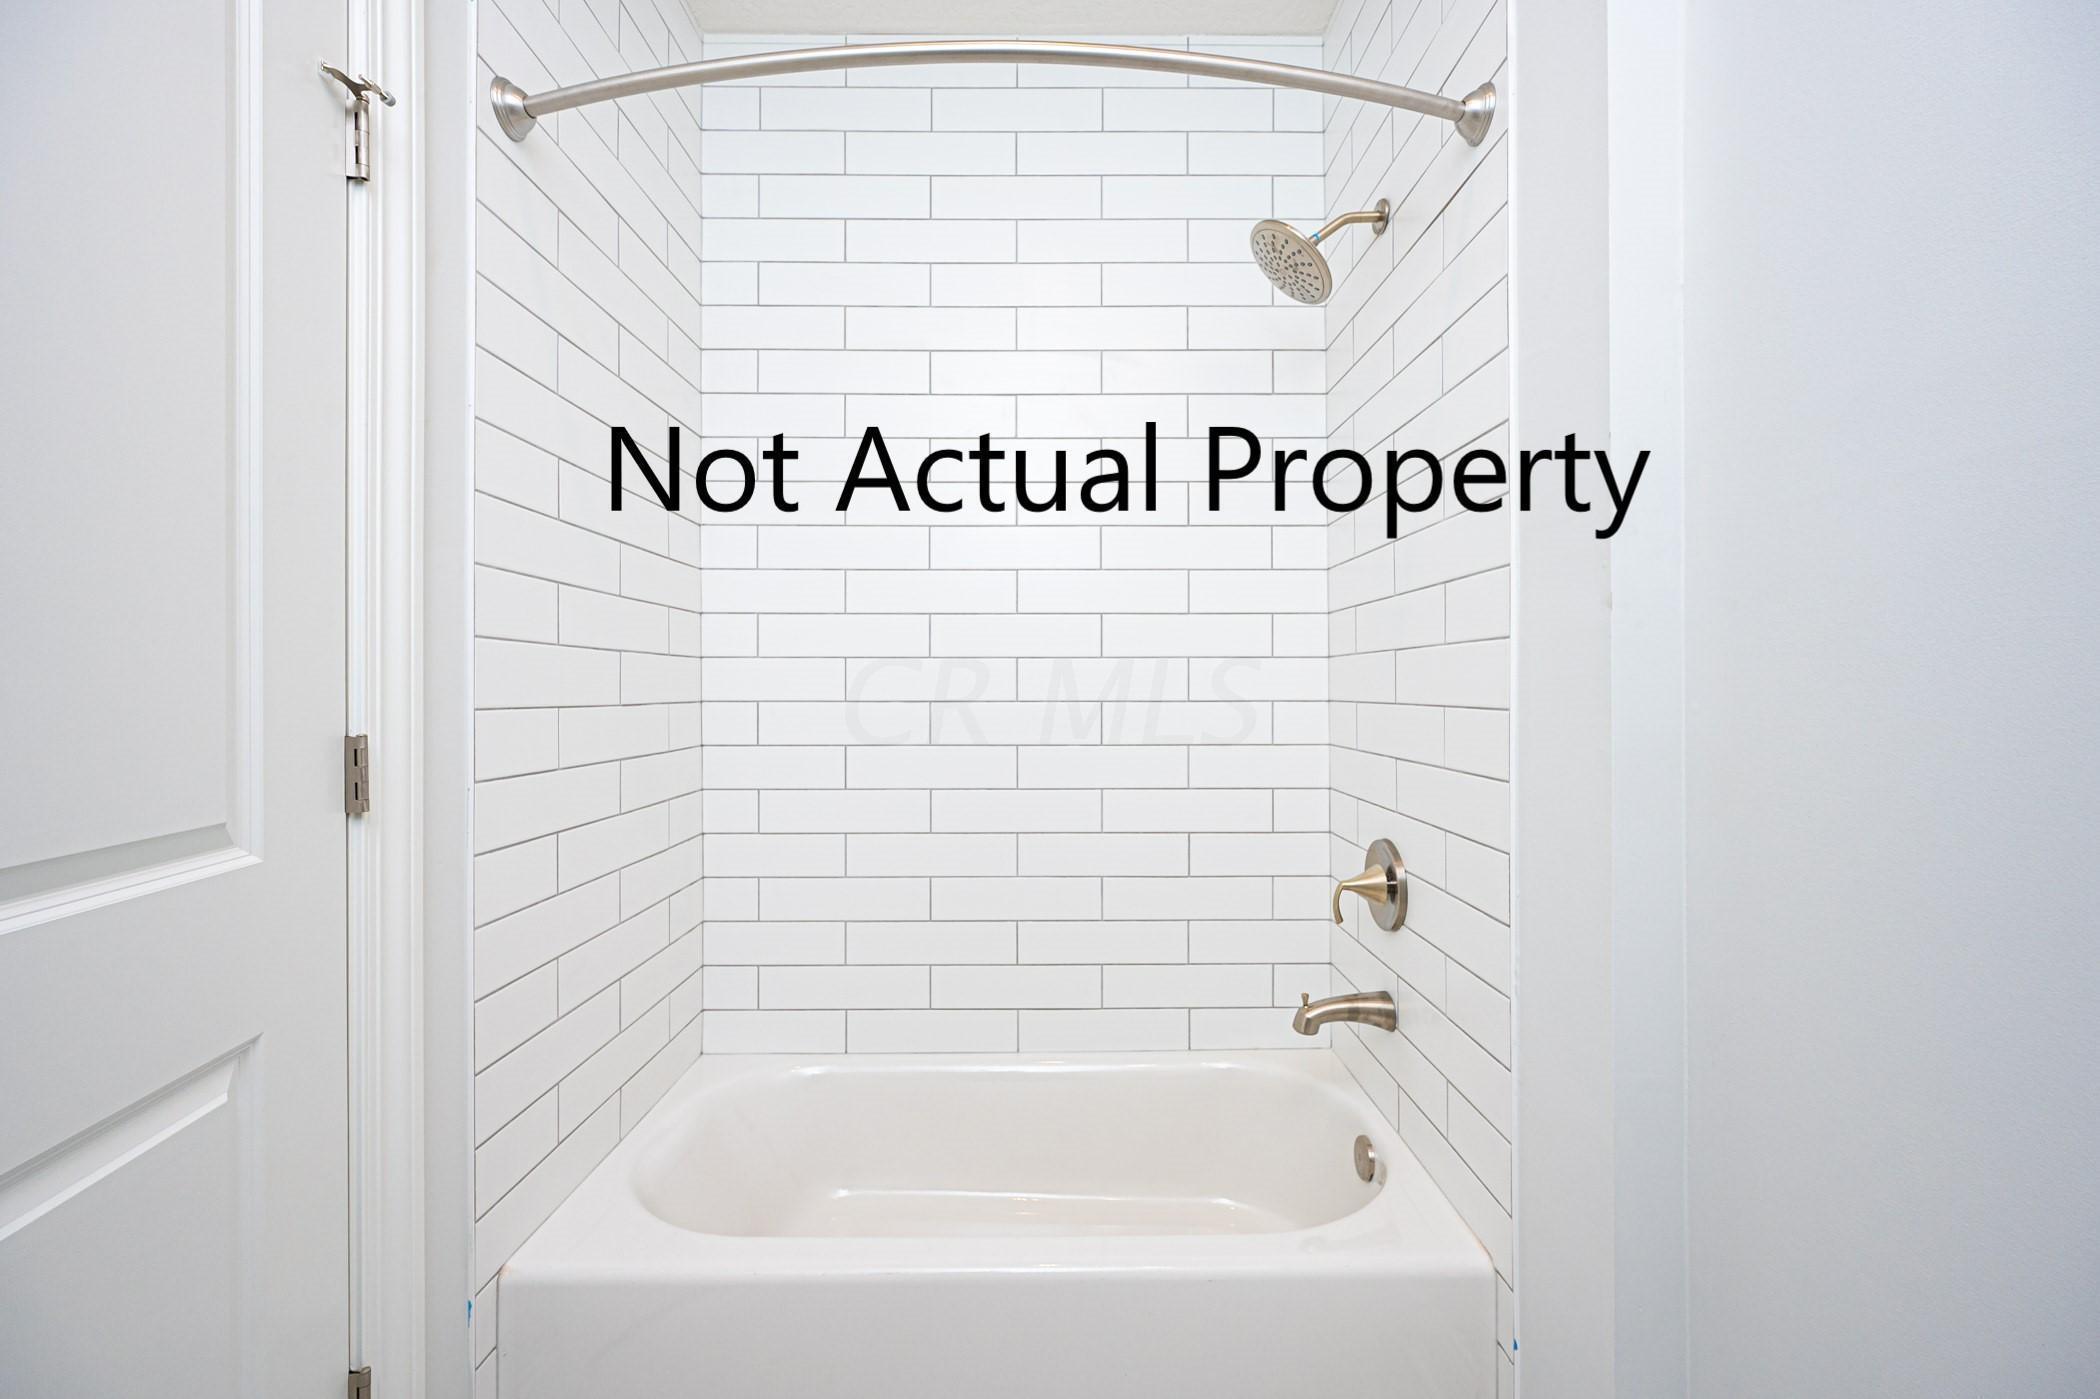 Viptual 2nd Story Bathroom Shower